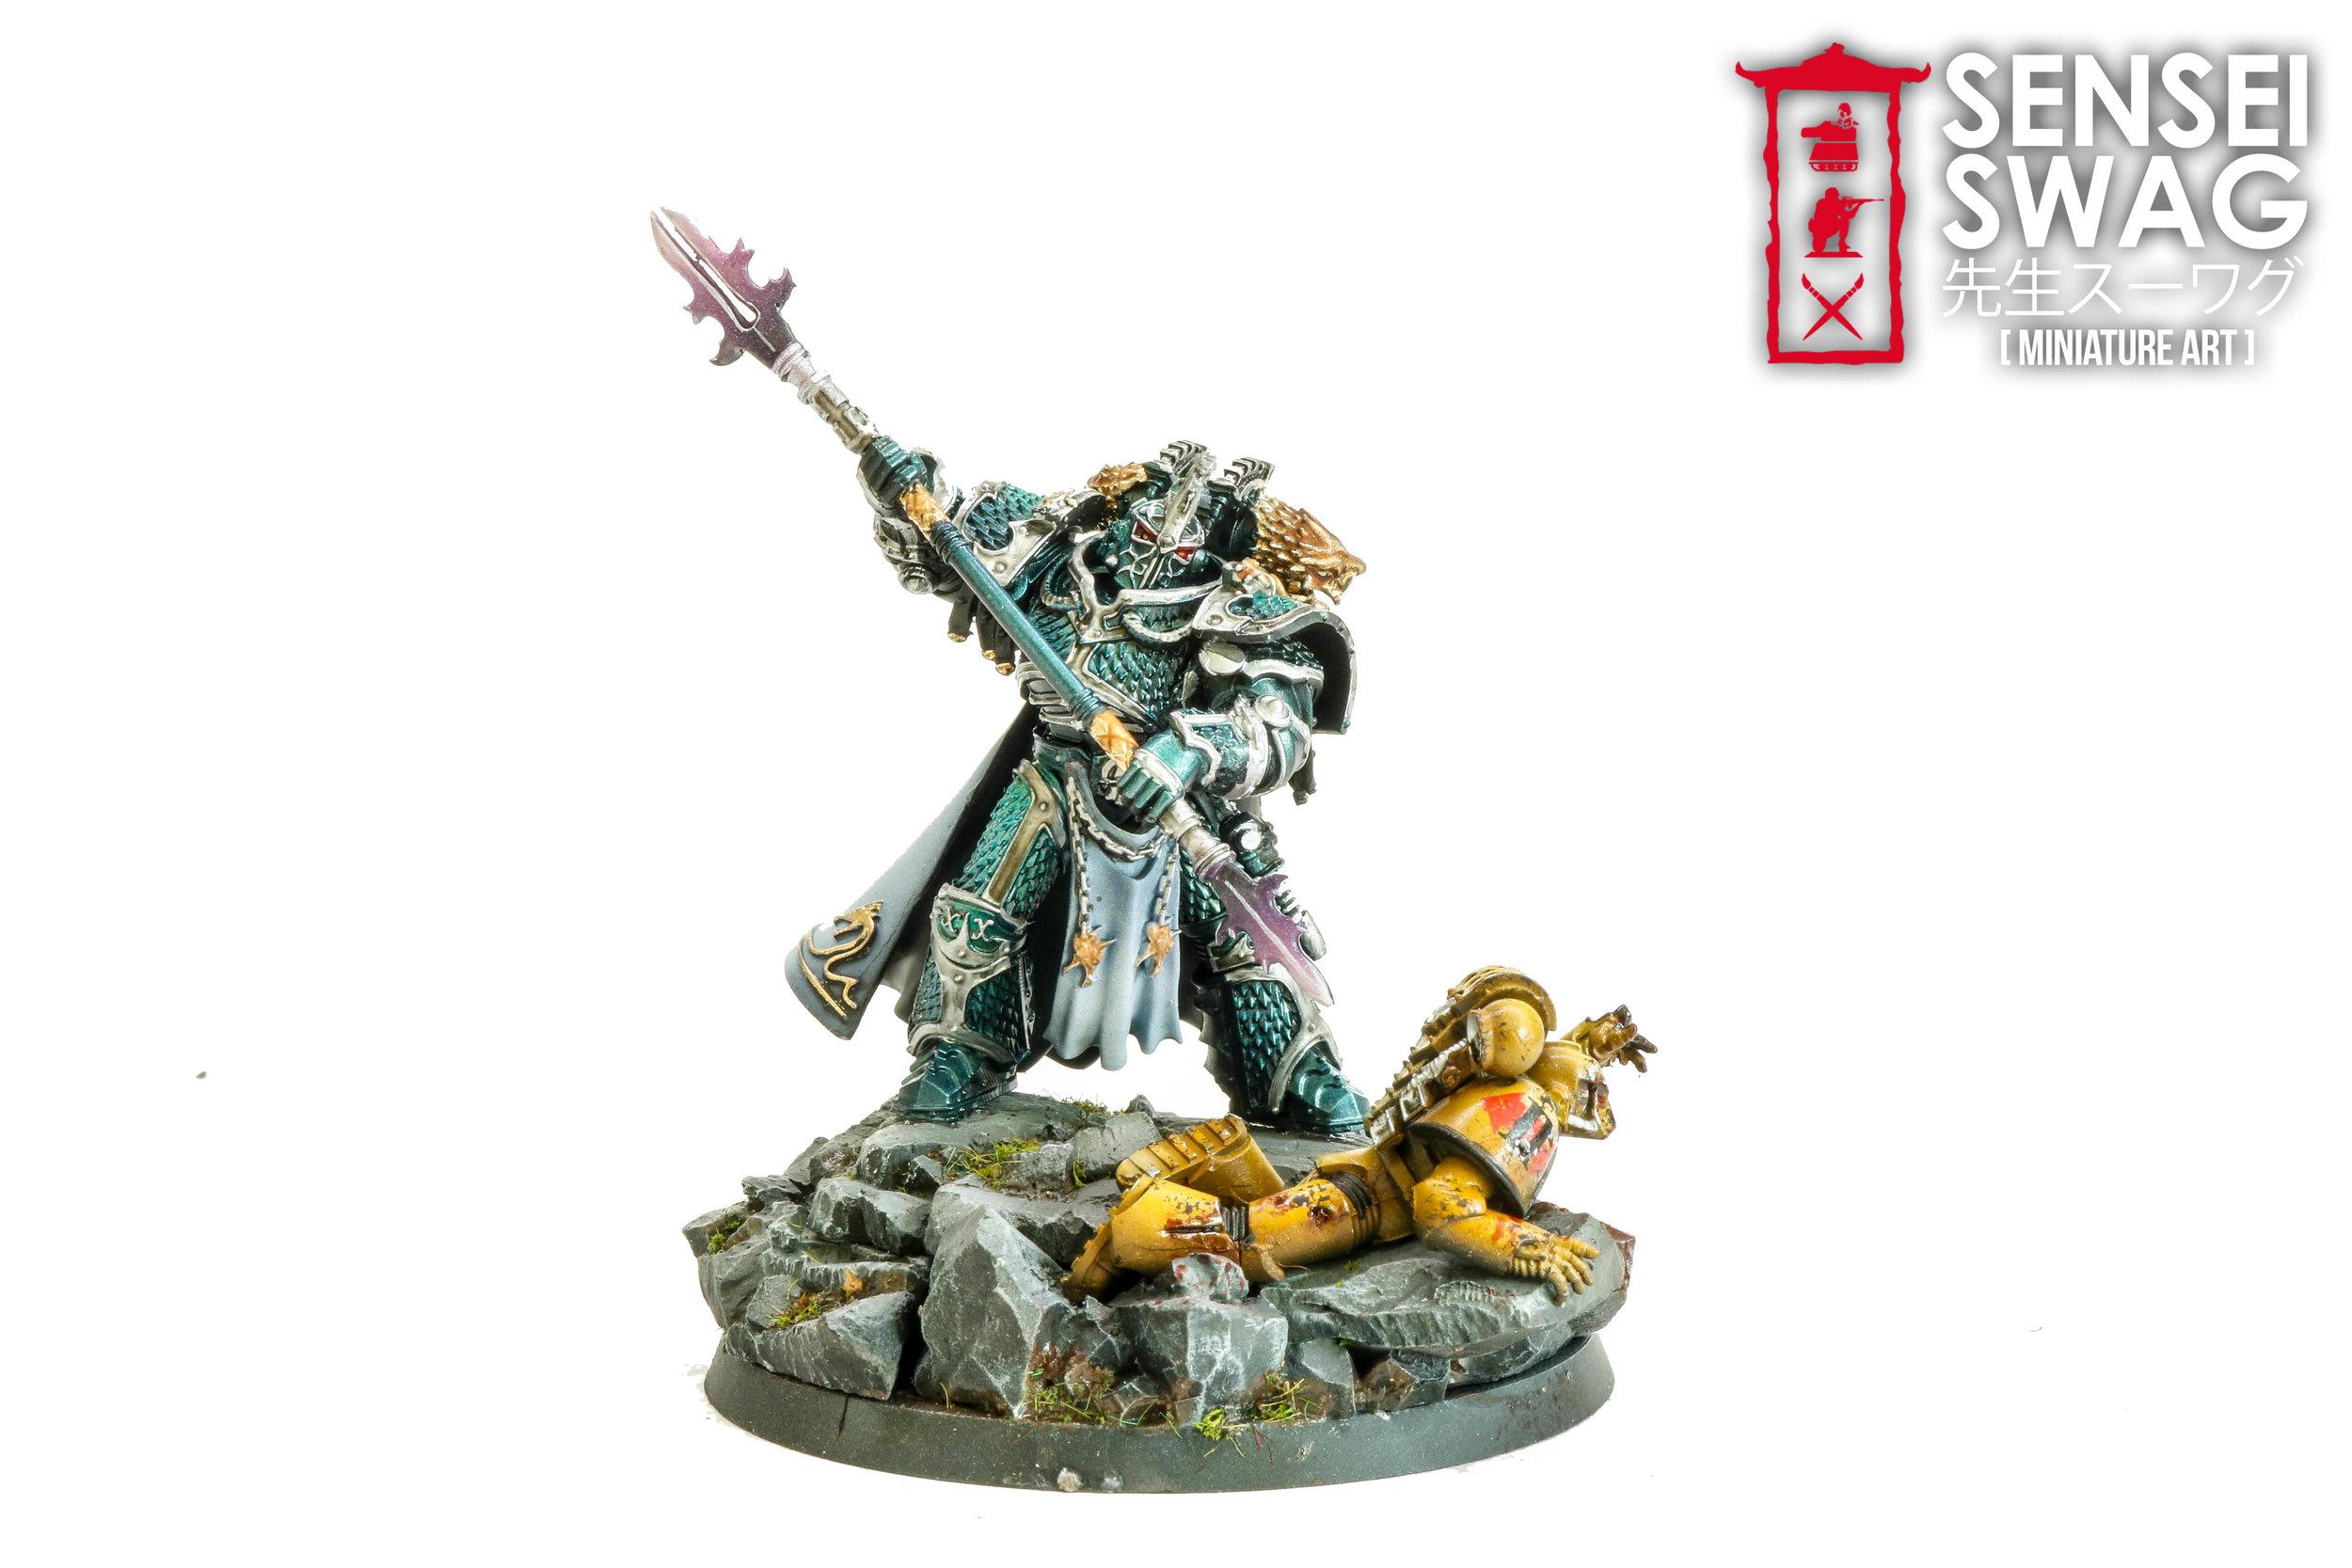 Pre-Heresy Alpha Legion 40k Horus Heresy Warhammer-2.jpg